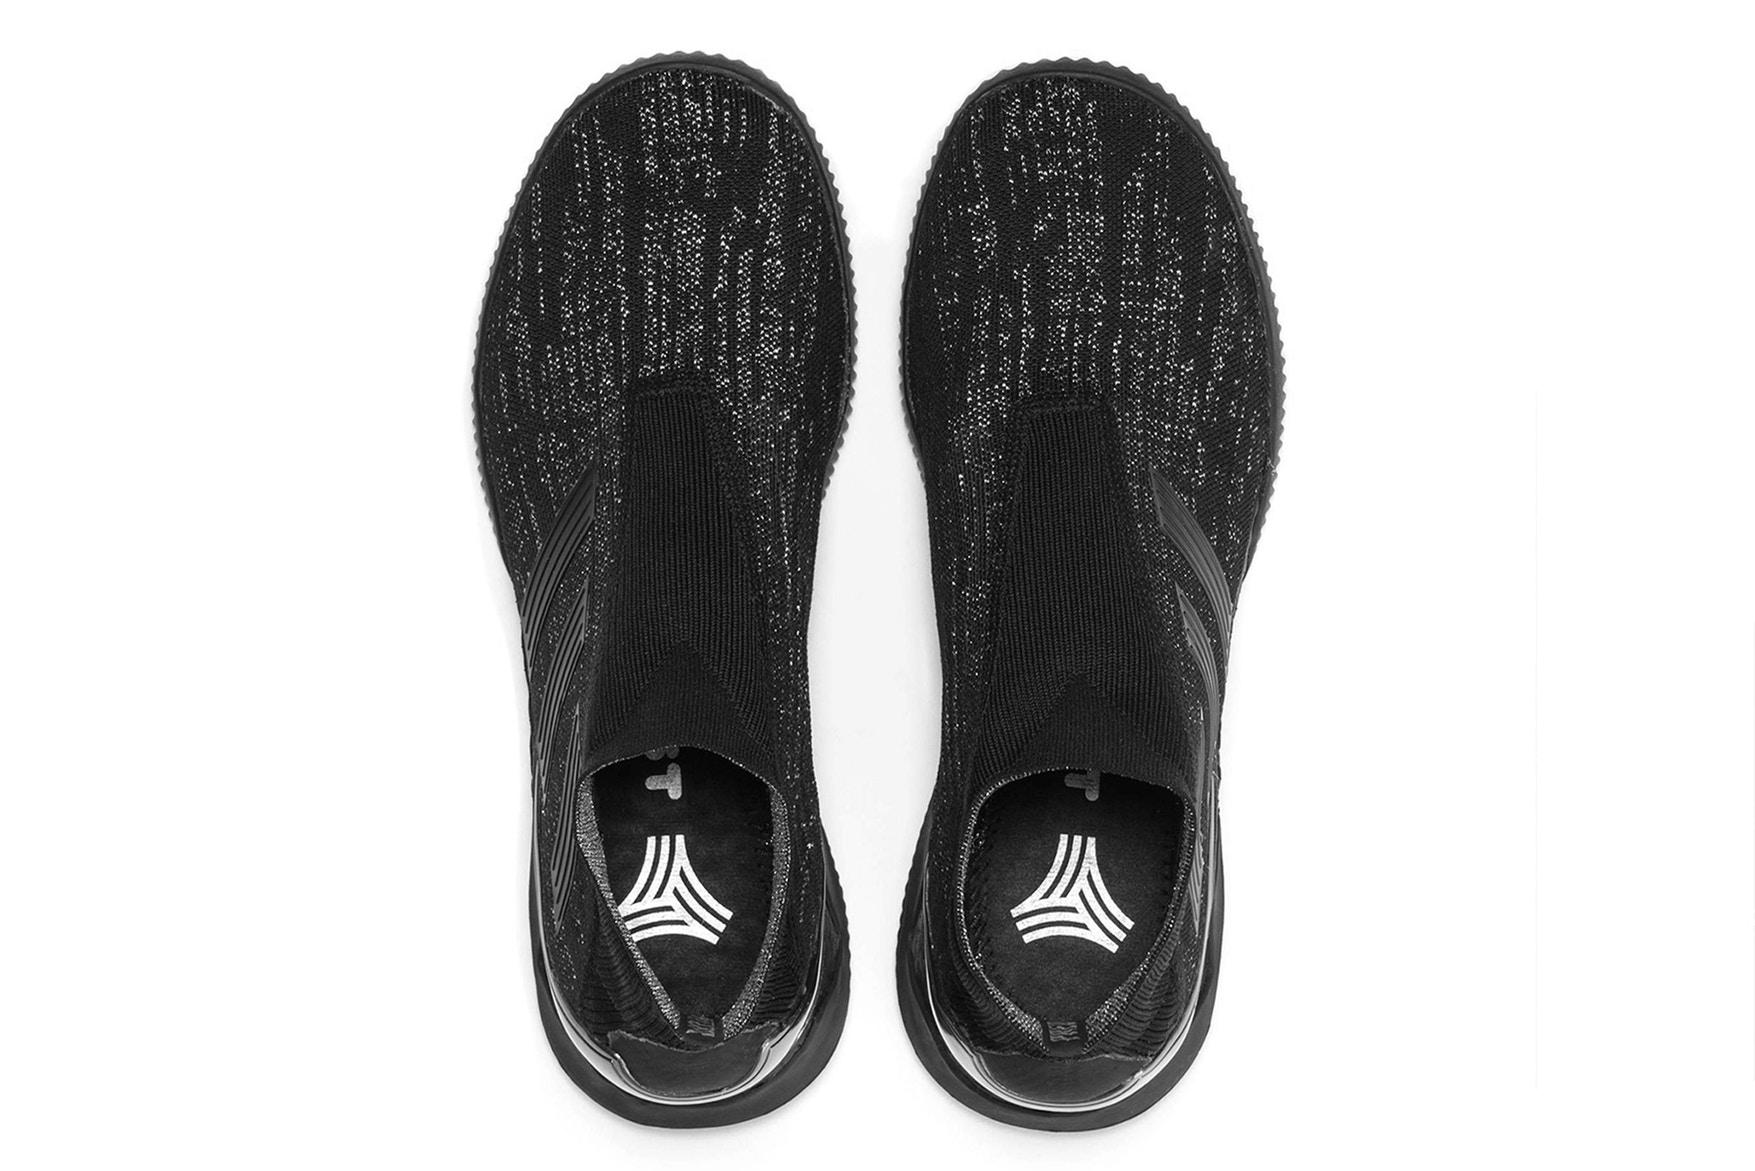 adidas-predator-tango-18-black-silver-release-info-3